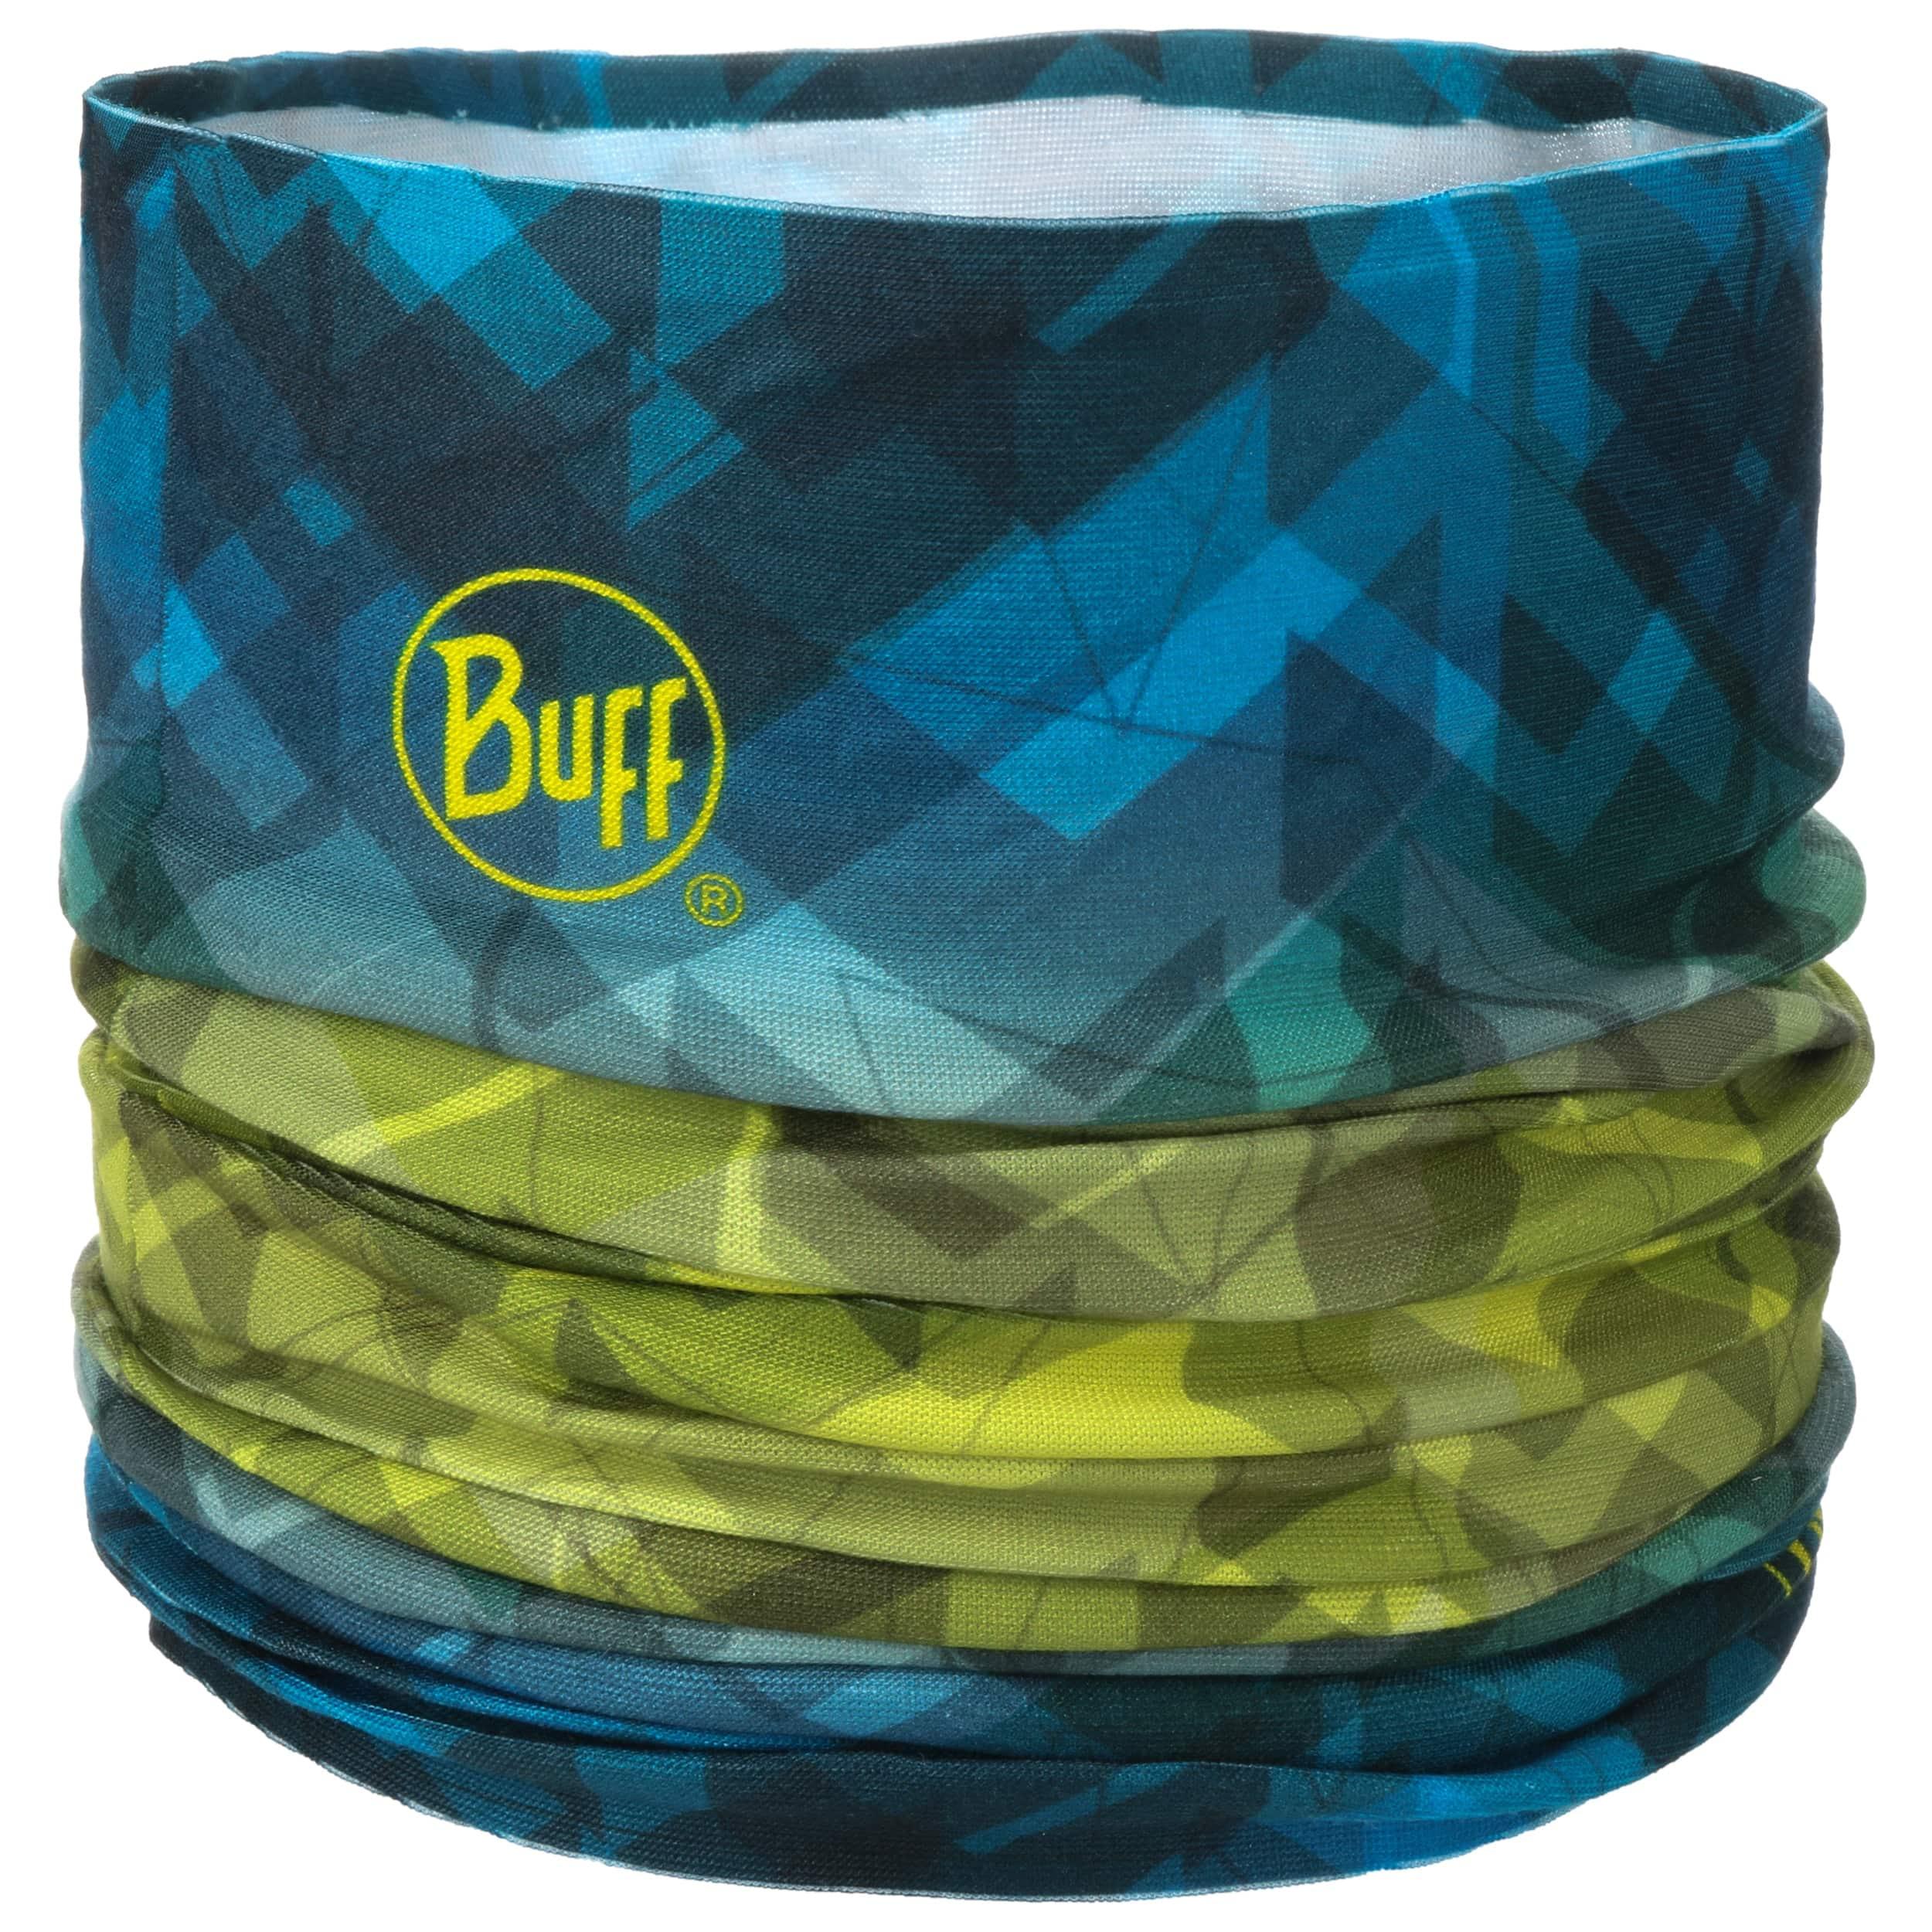 Multifunctional Bandana Arrowhead By Buff Gbp 2195 Hats Caps Outwear Mixed Colours 1